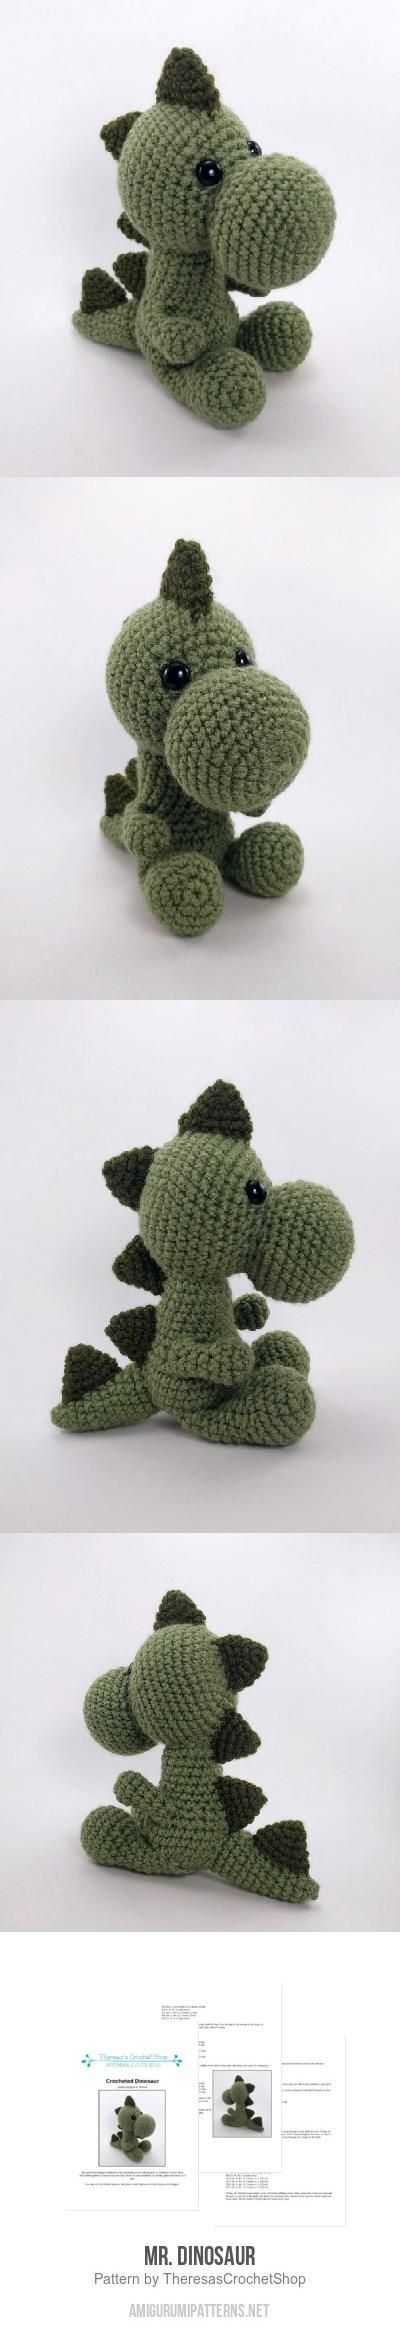 51 best Amigurumi-Dinasaurs images on Pinterest | Crochet animals ...